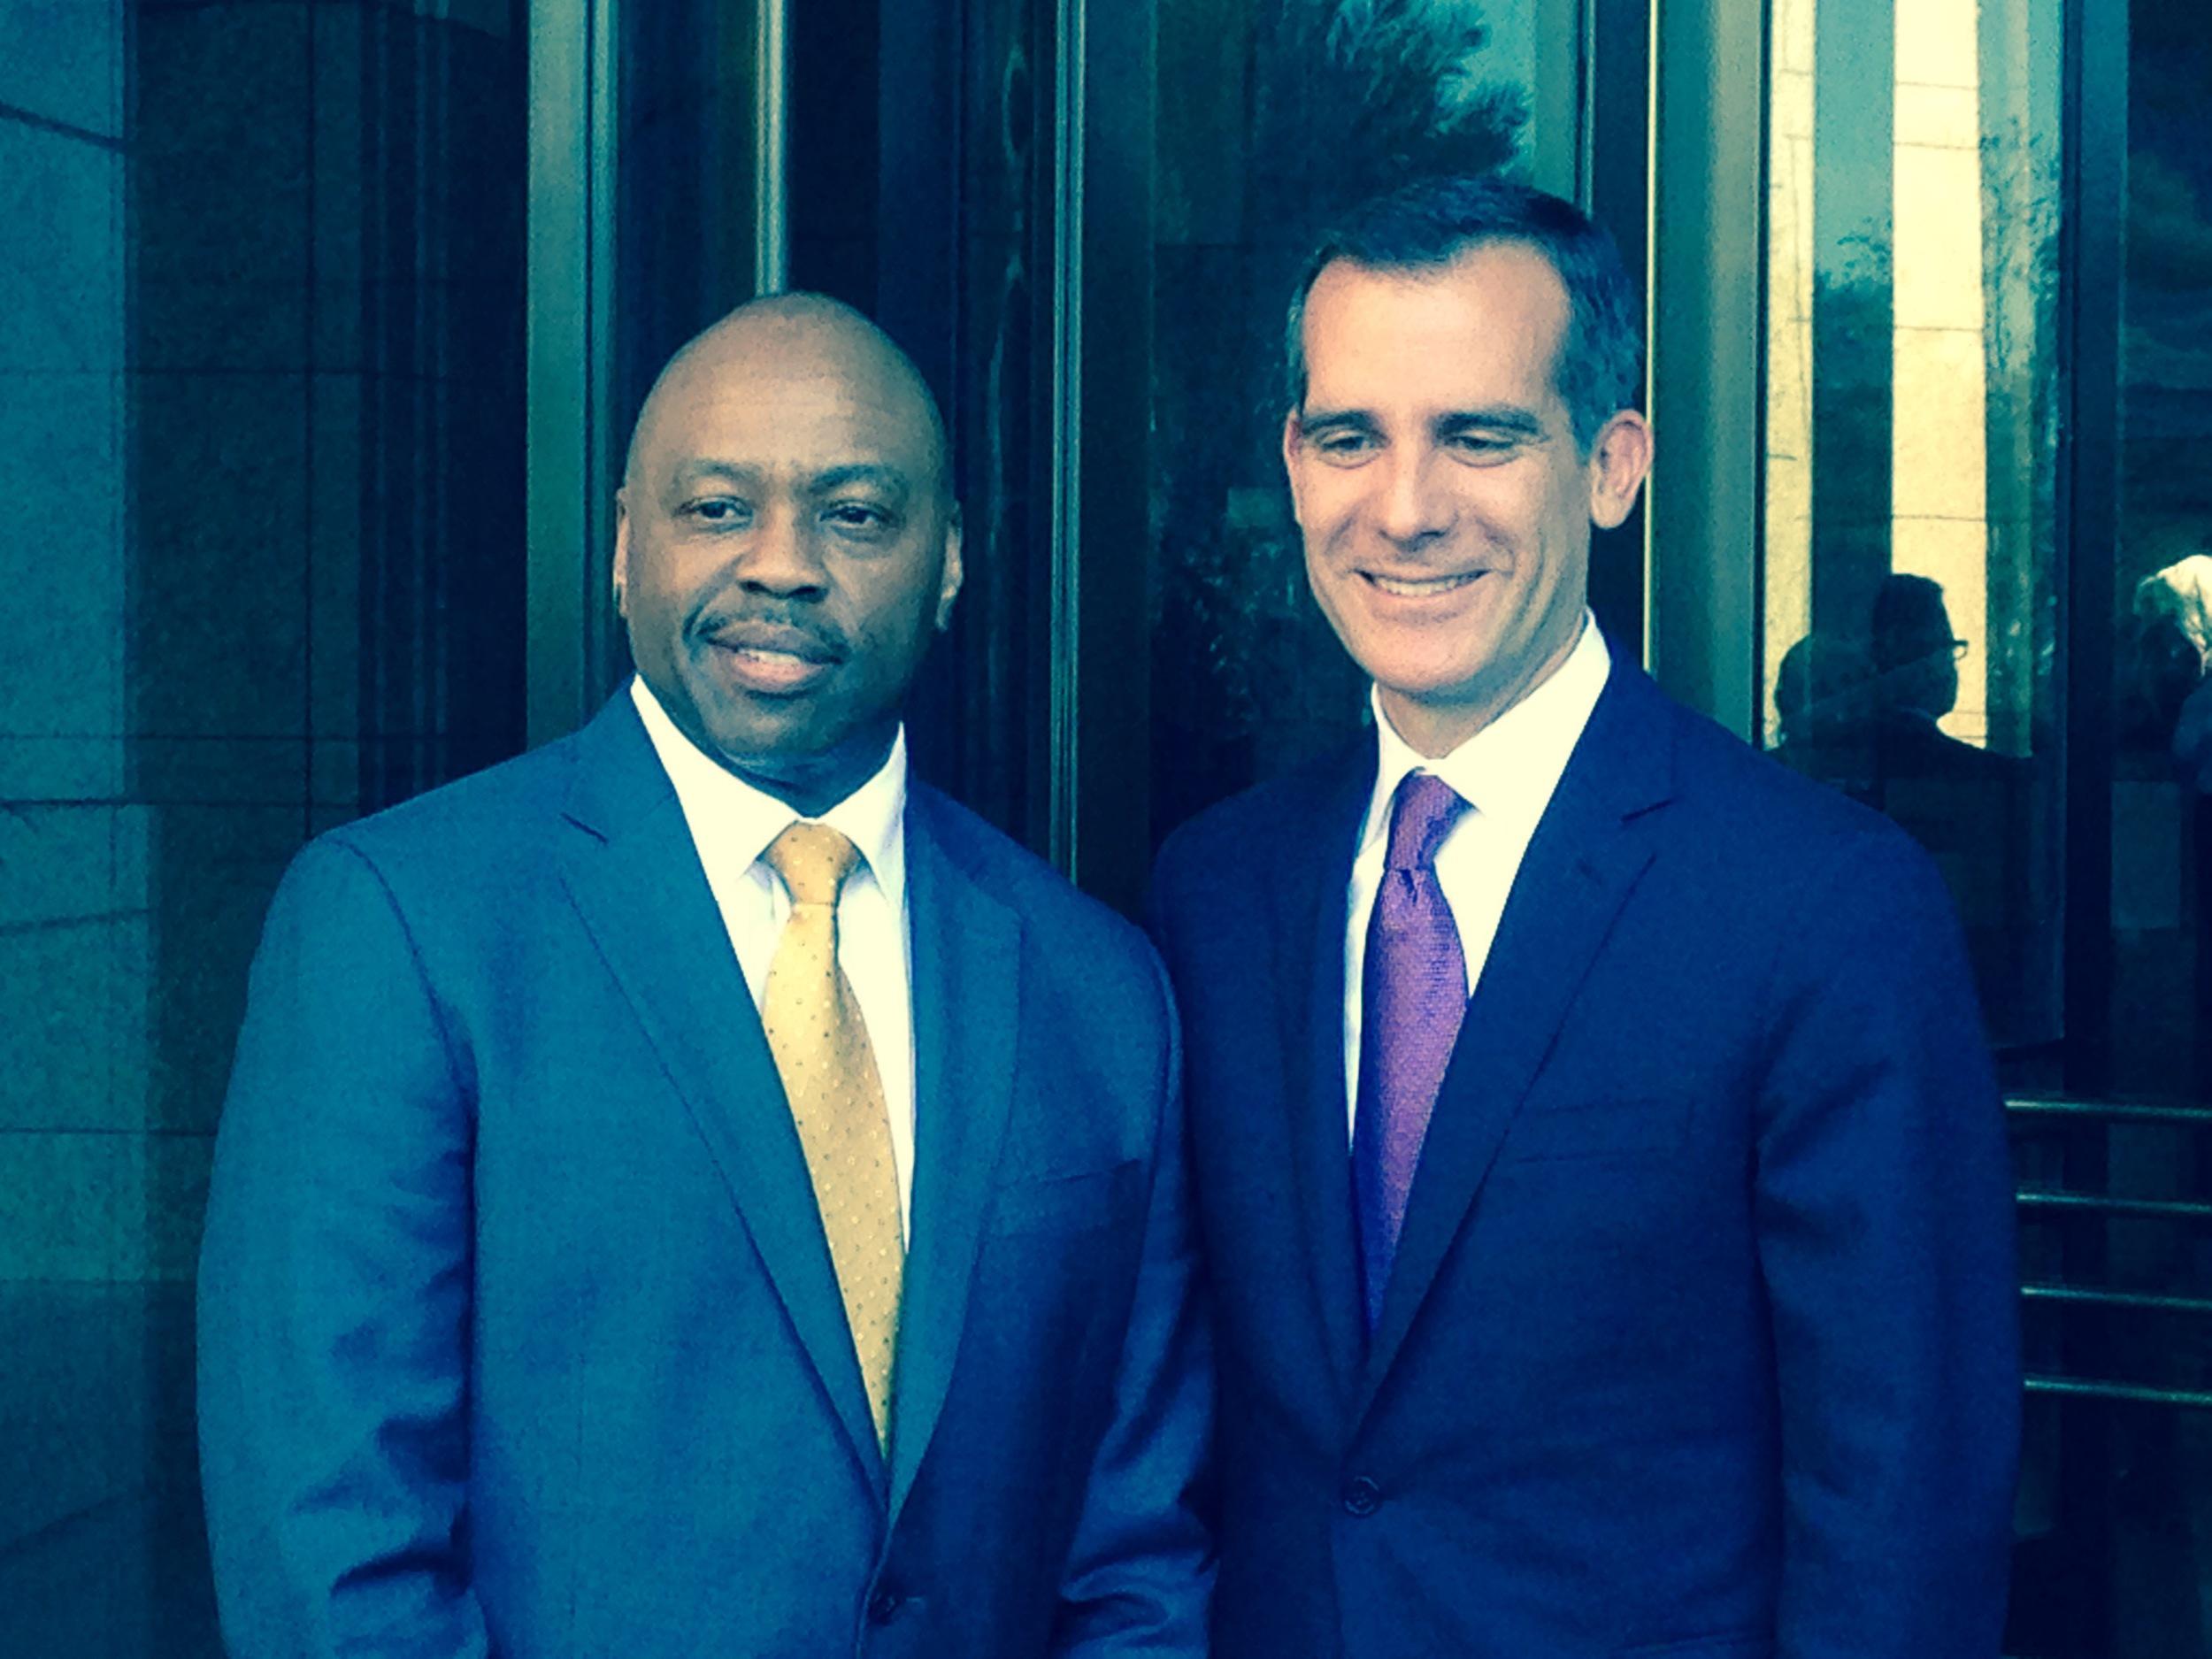 Phil Washington and Mayor Eric Garcetti pose for photos with the media.